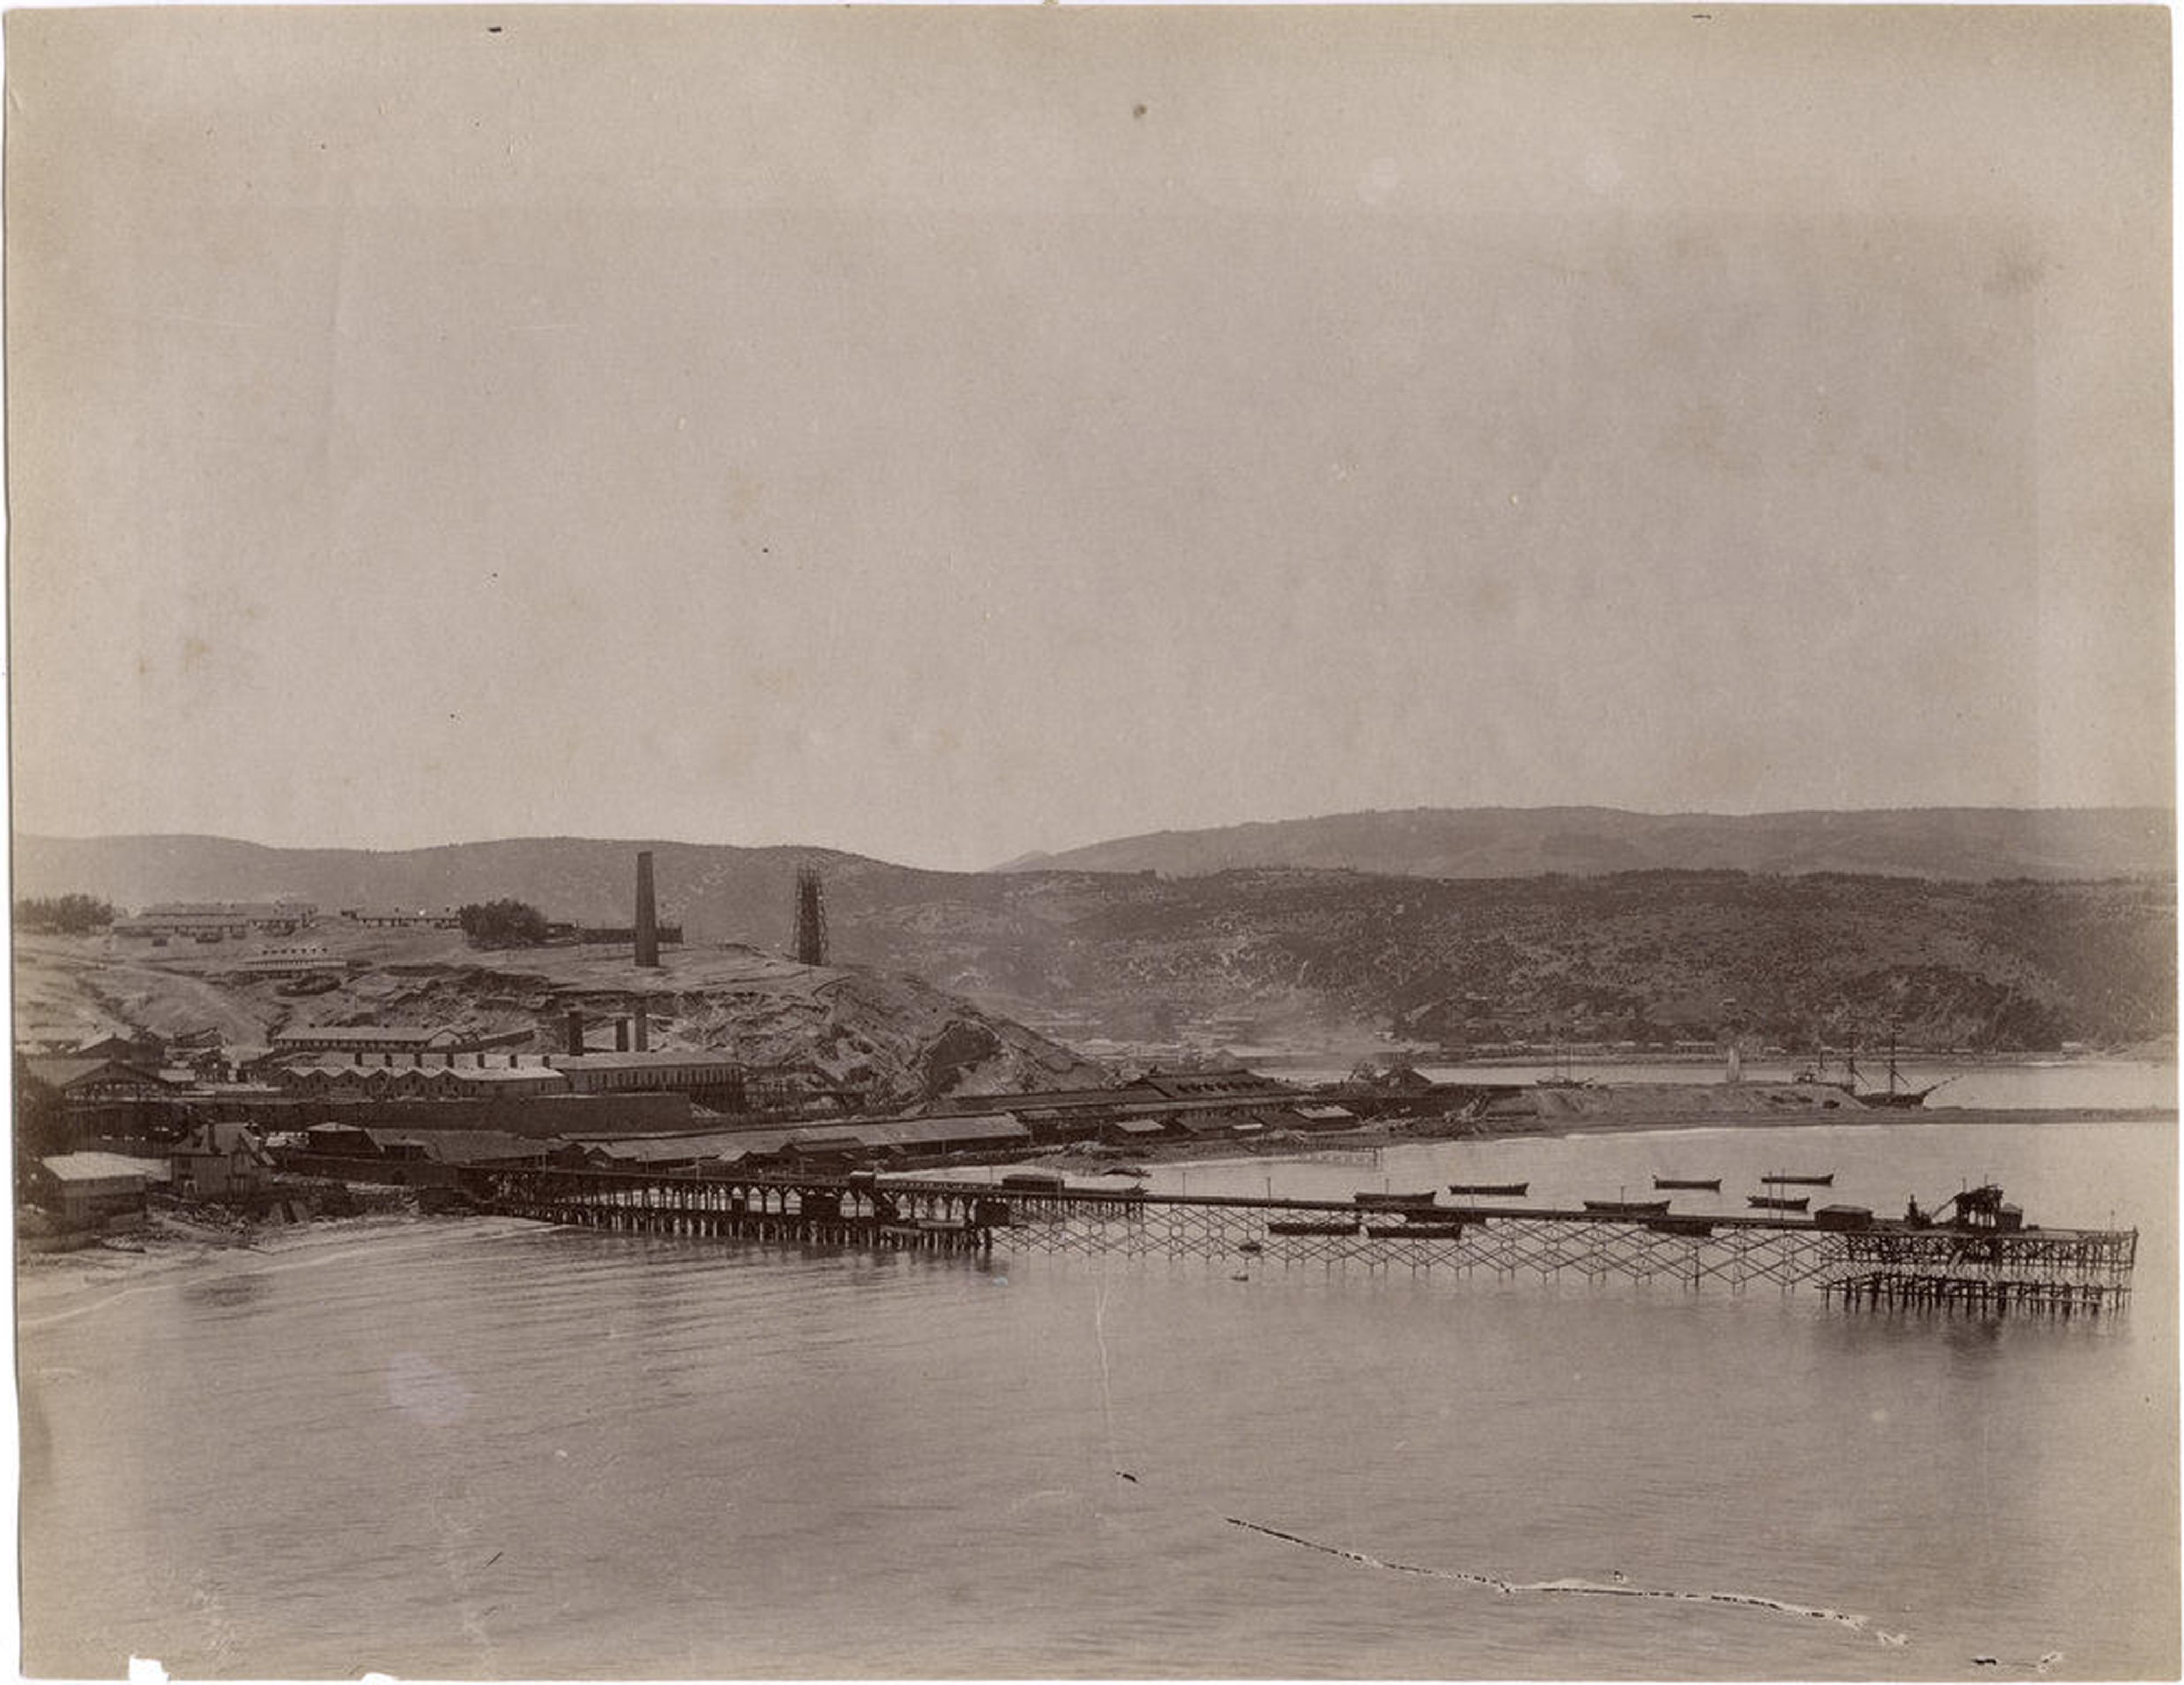 Enterreno - Fotos históricas de chile - fotos antiguas de Chile - Muelle de Lota, 1890